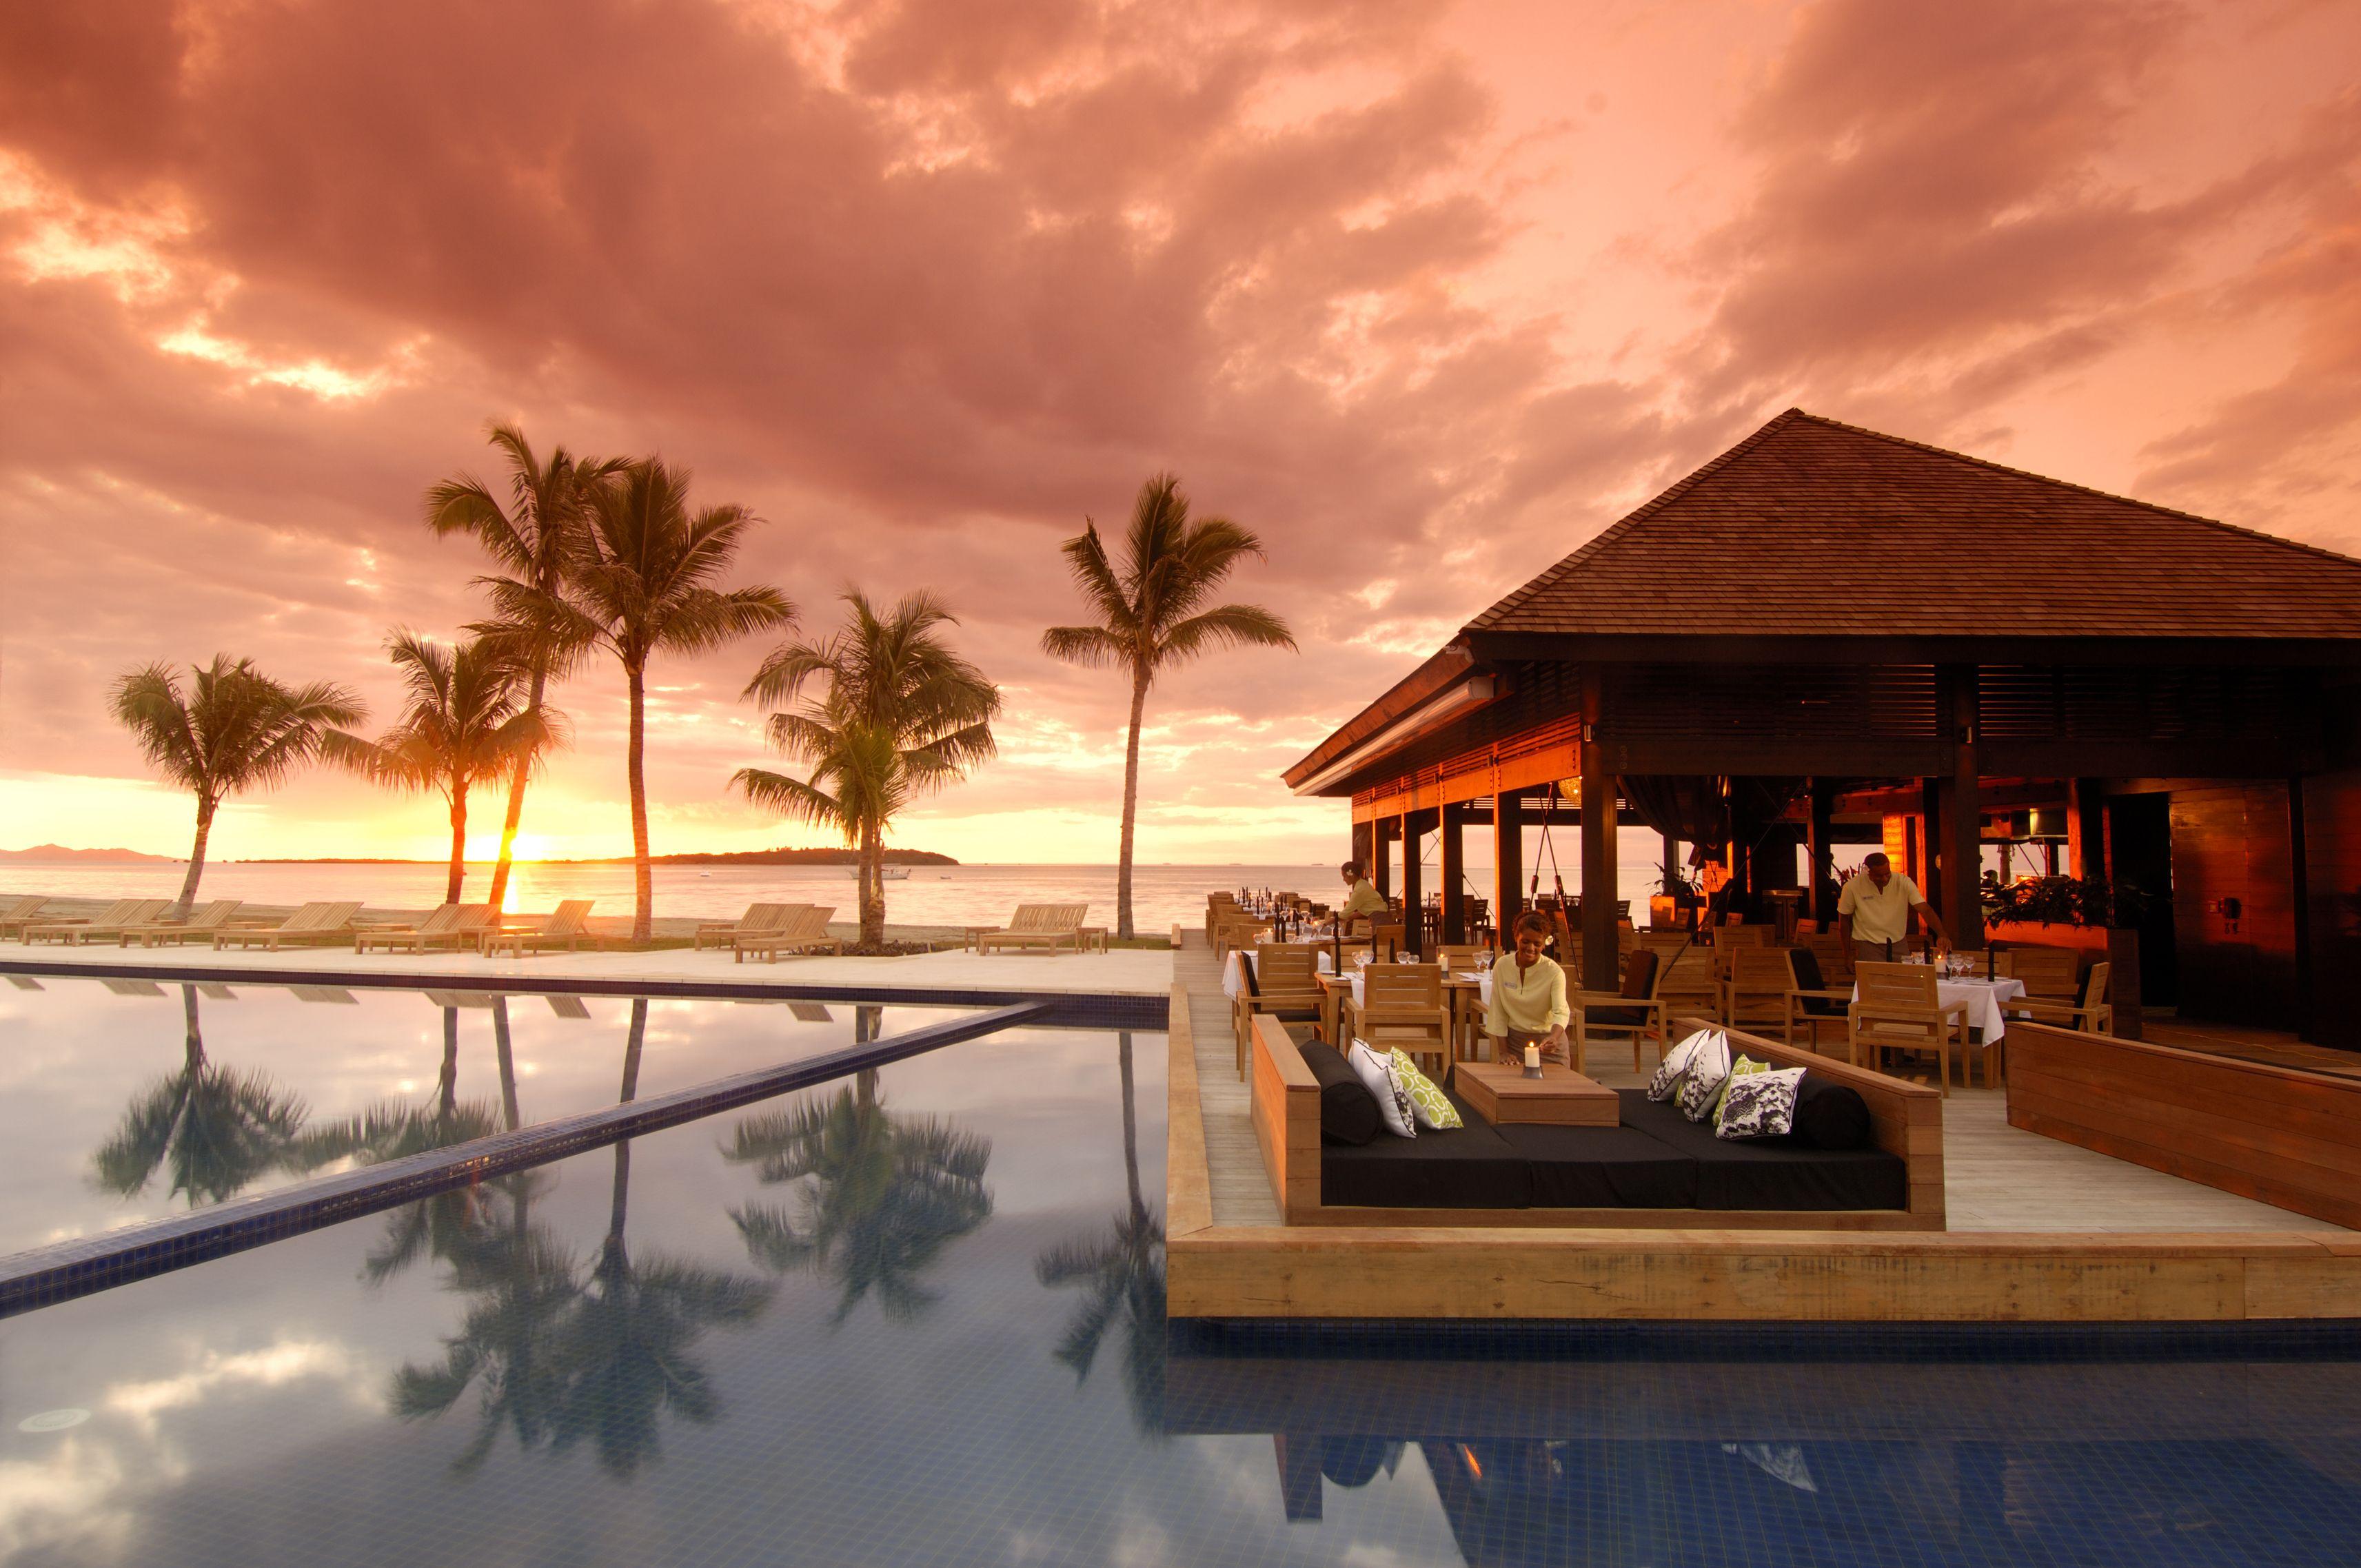 Location Hilton Fiji Beach Resort u0026